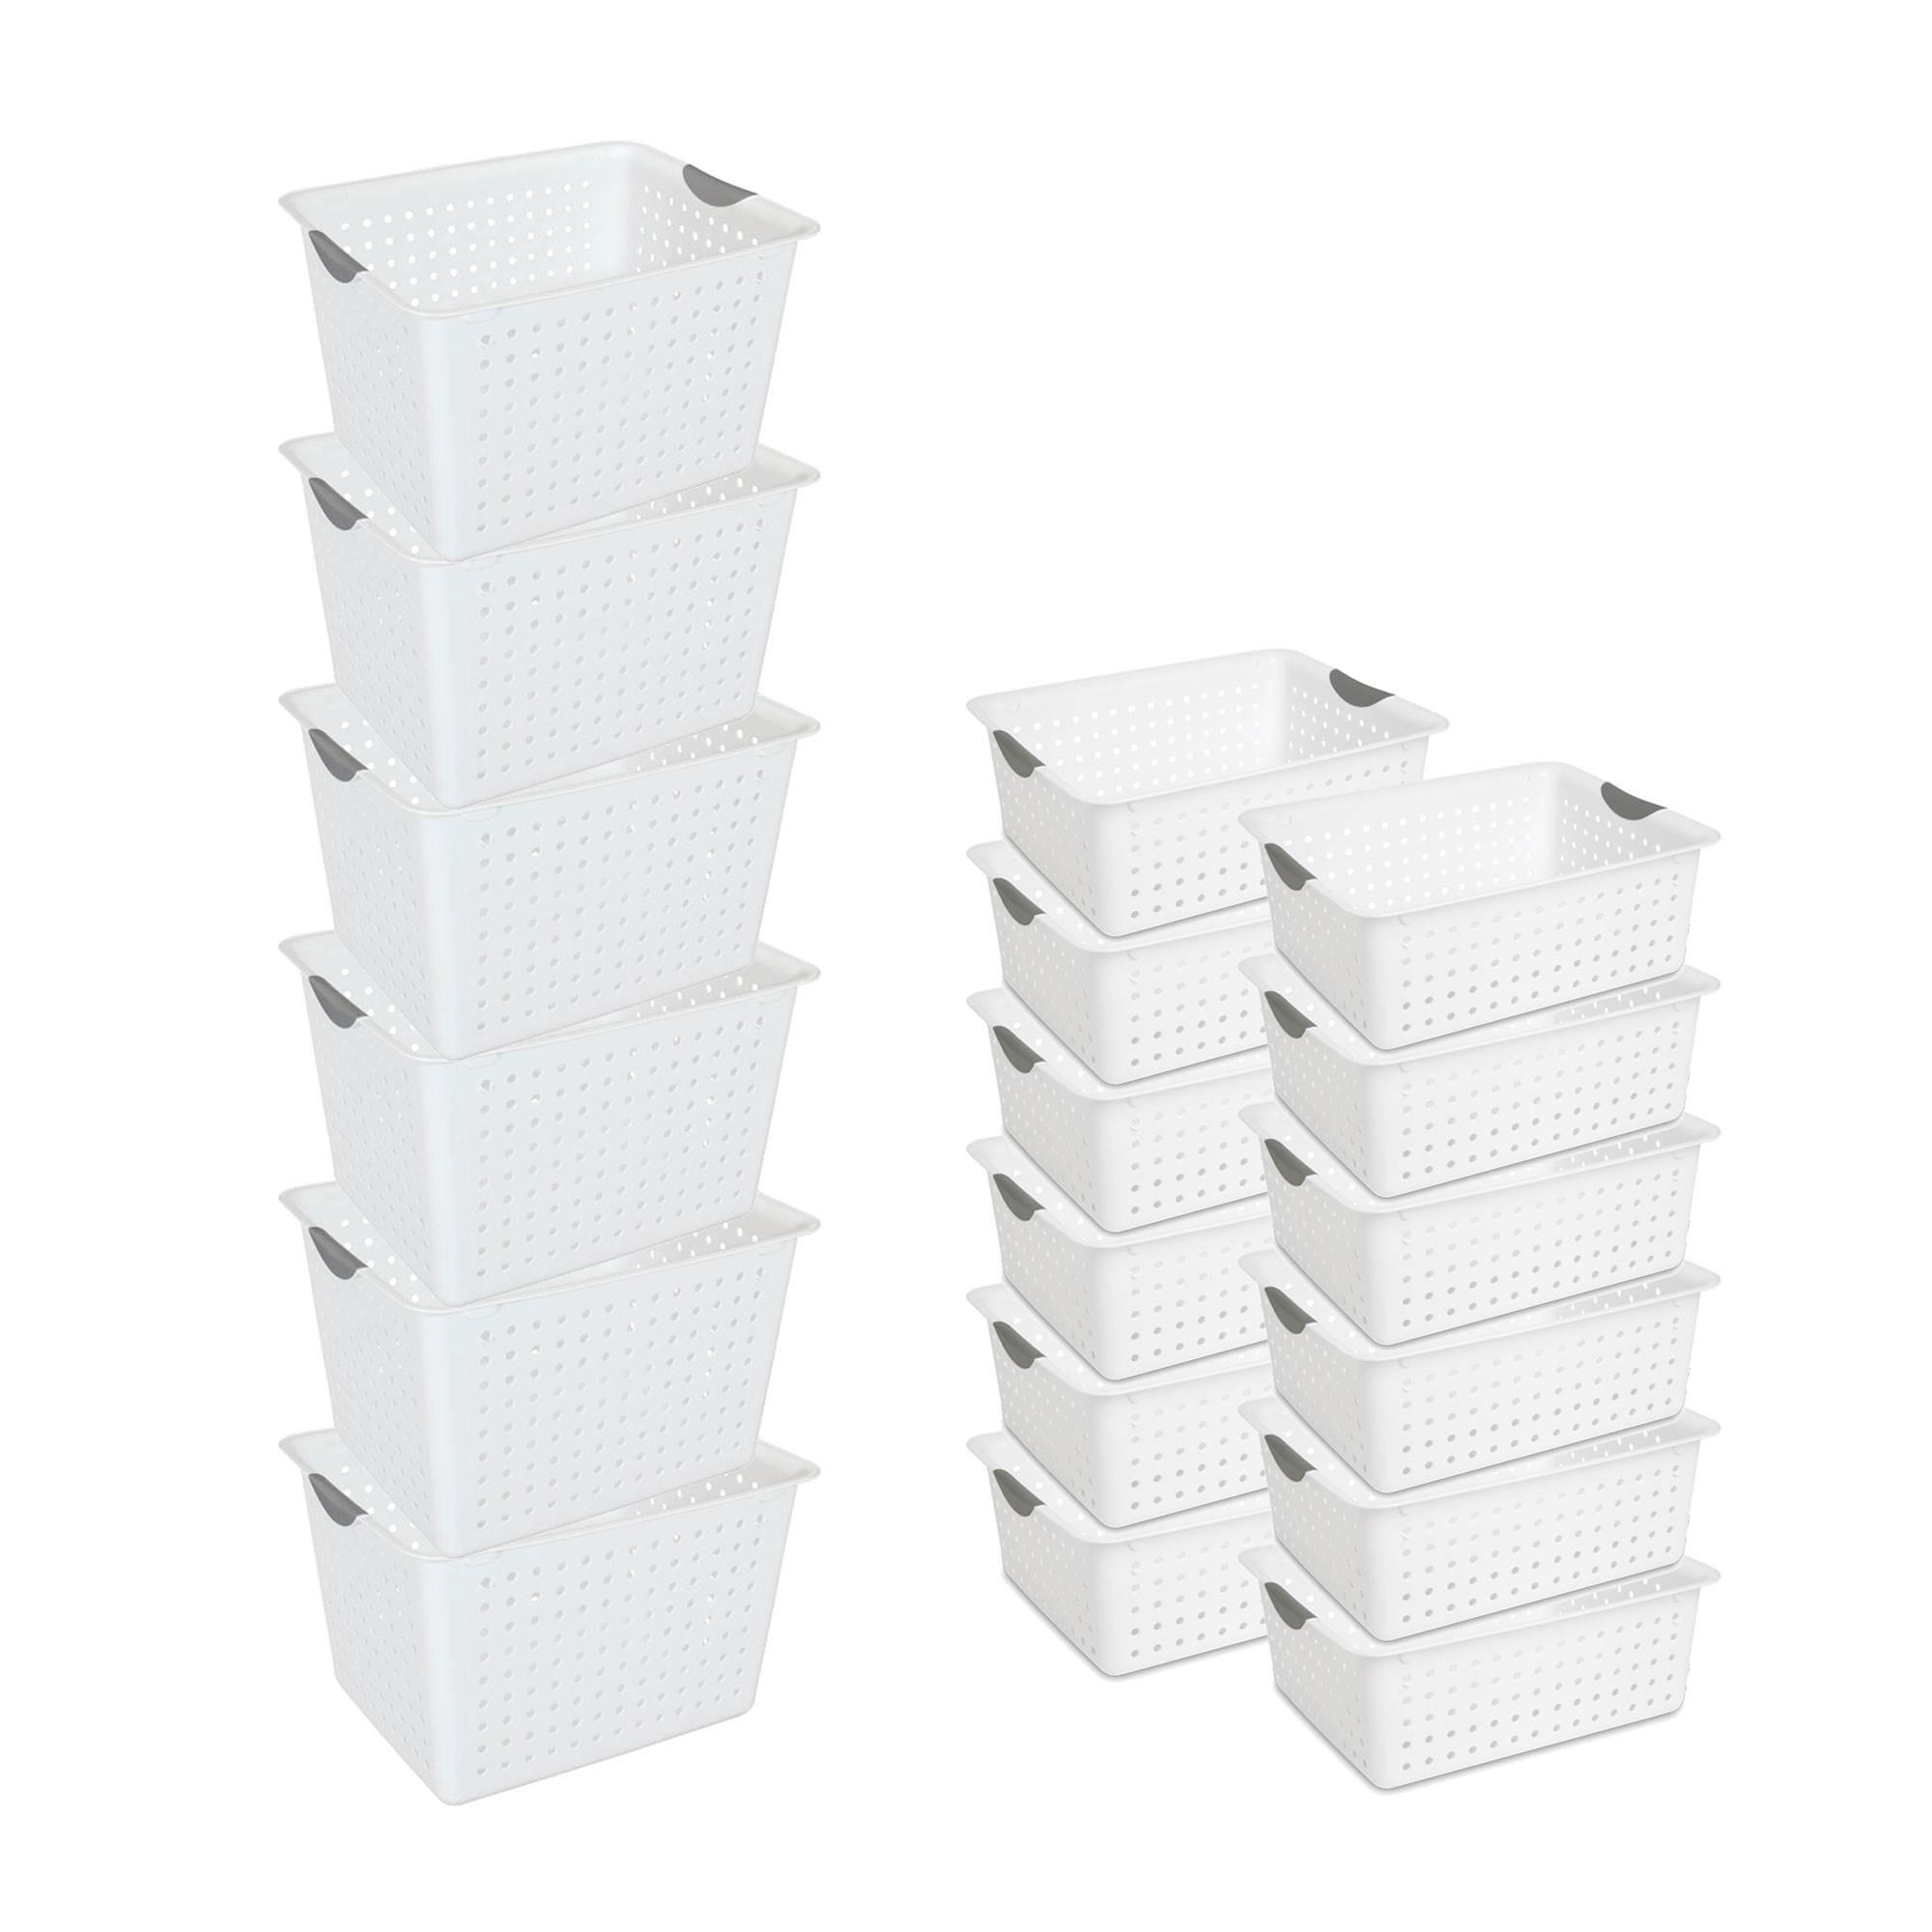 Sterilite Deep Ultra Plastic Storage Bin Basket 6 Pack Large Bin 12 Pack Walmart Com Walmart Com